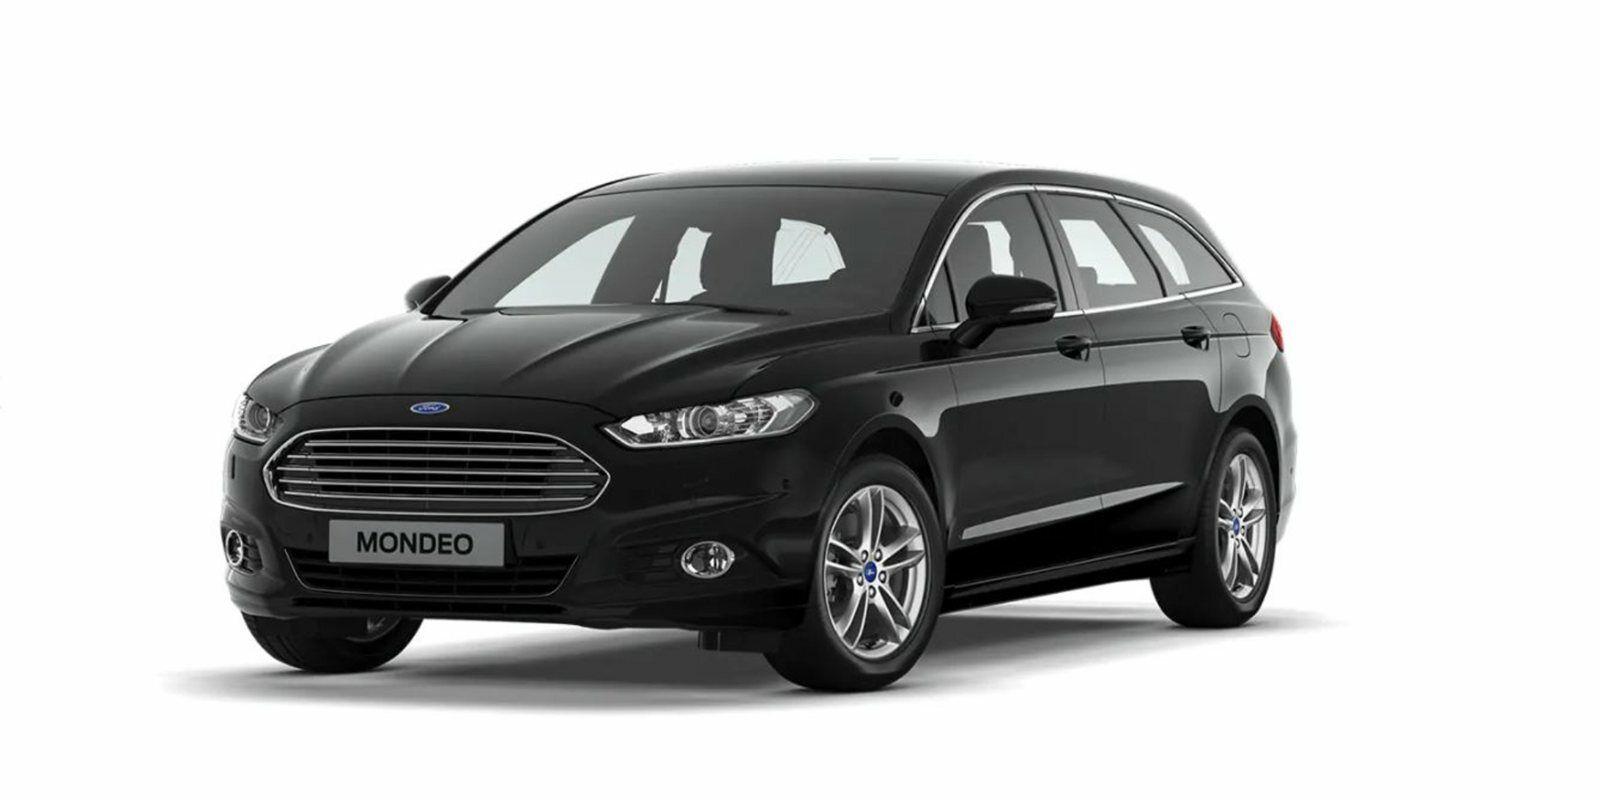 Ford Mondeo 2,0 TDCi 150 Titanium stc. 5d - 319.900 kr.